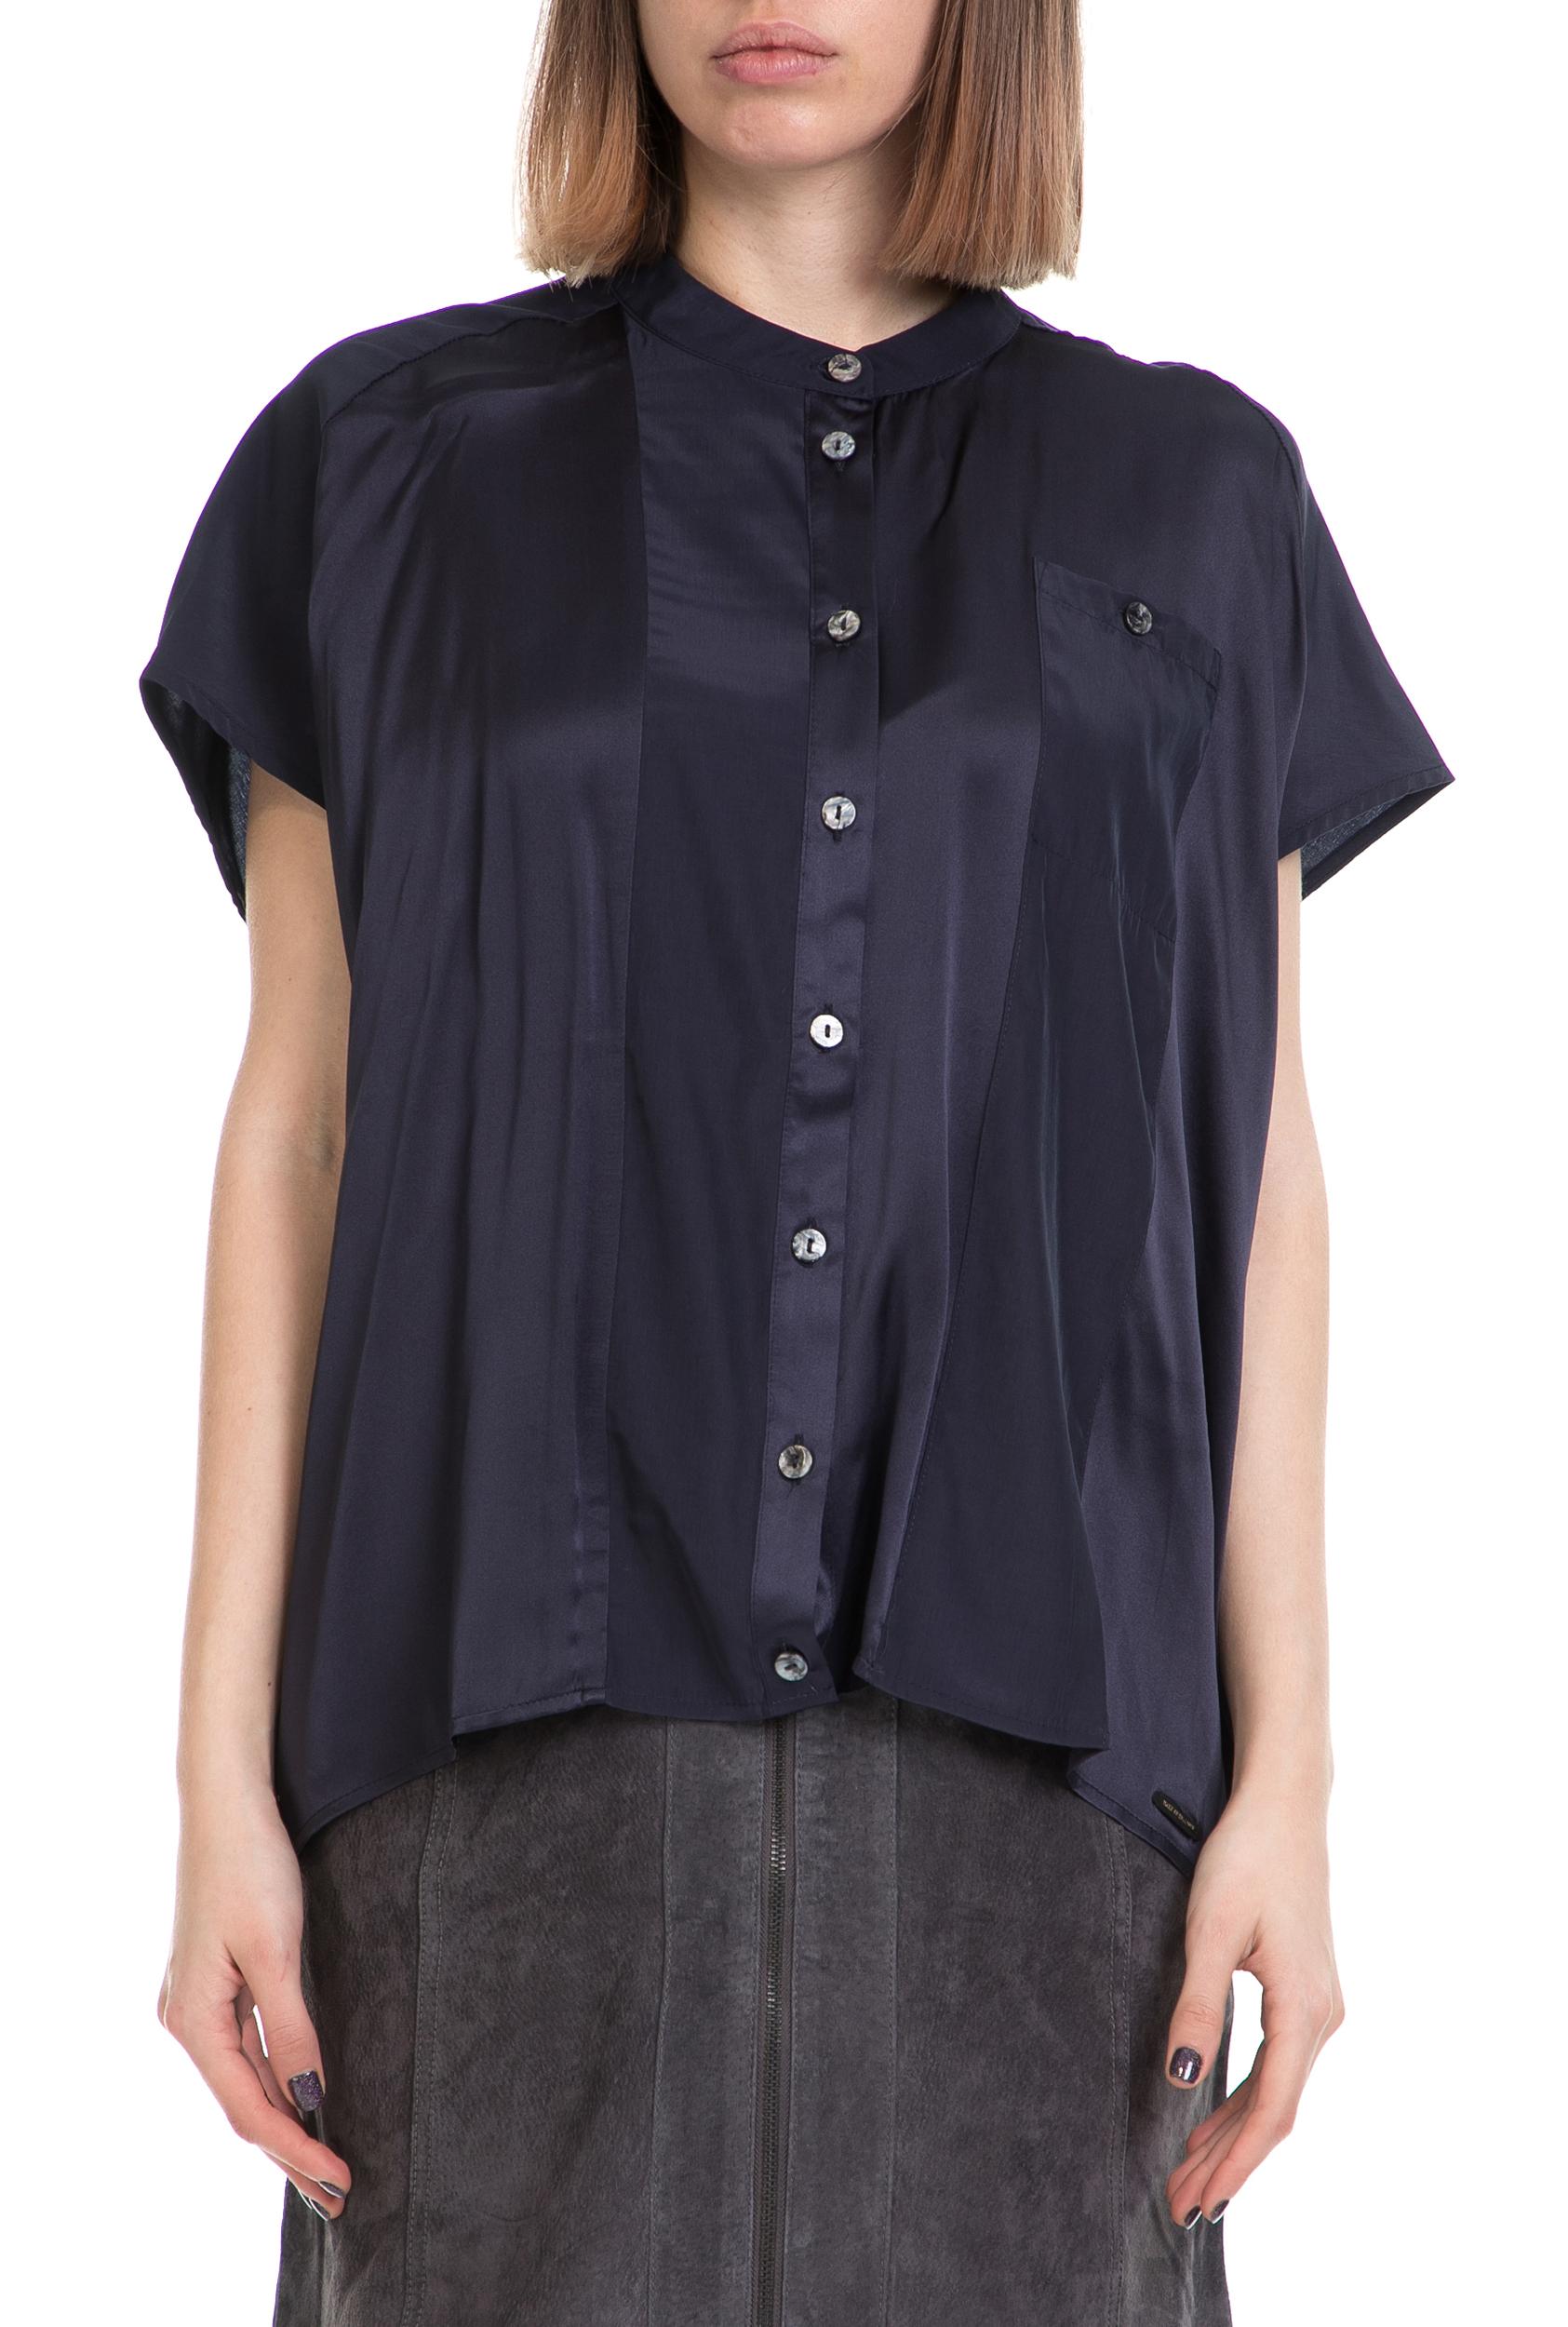 1583053faac0 CollectiveOnline NUMPH - Γυναικείο πουκάμισο NUMPH μπλε